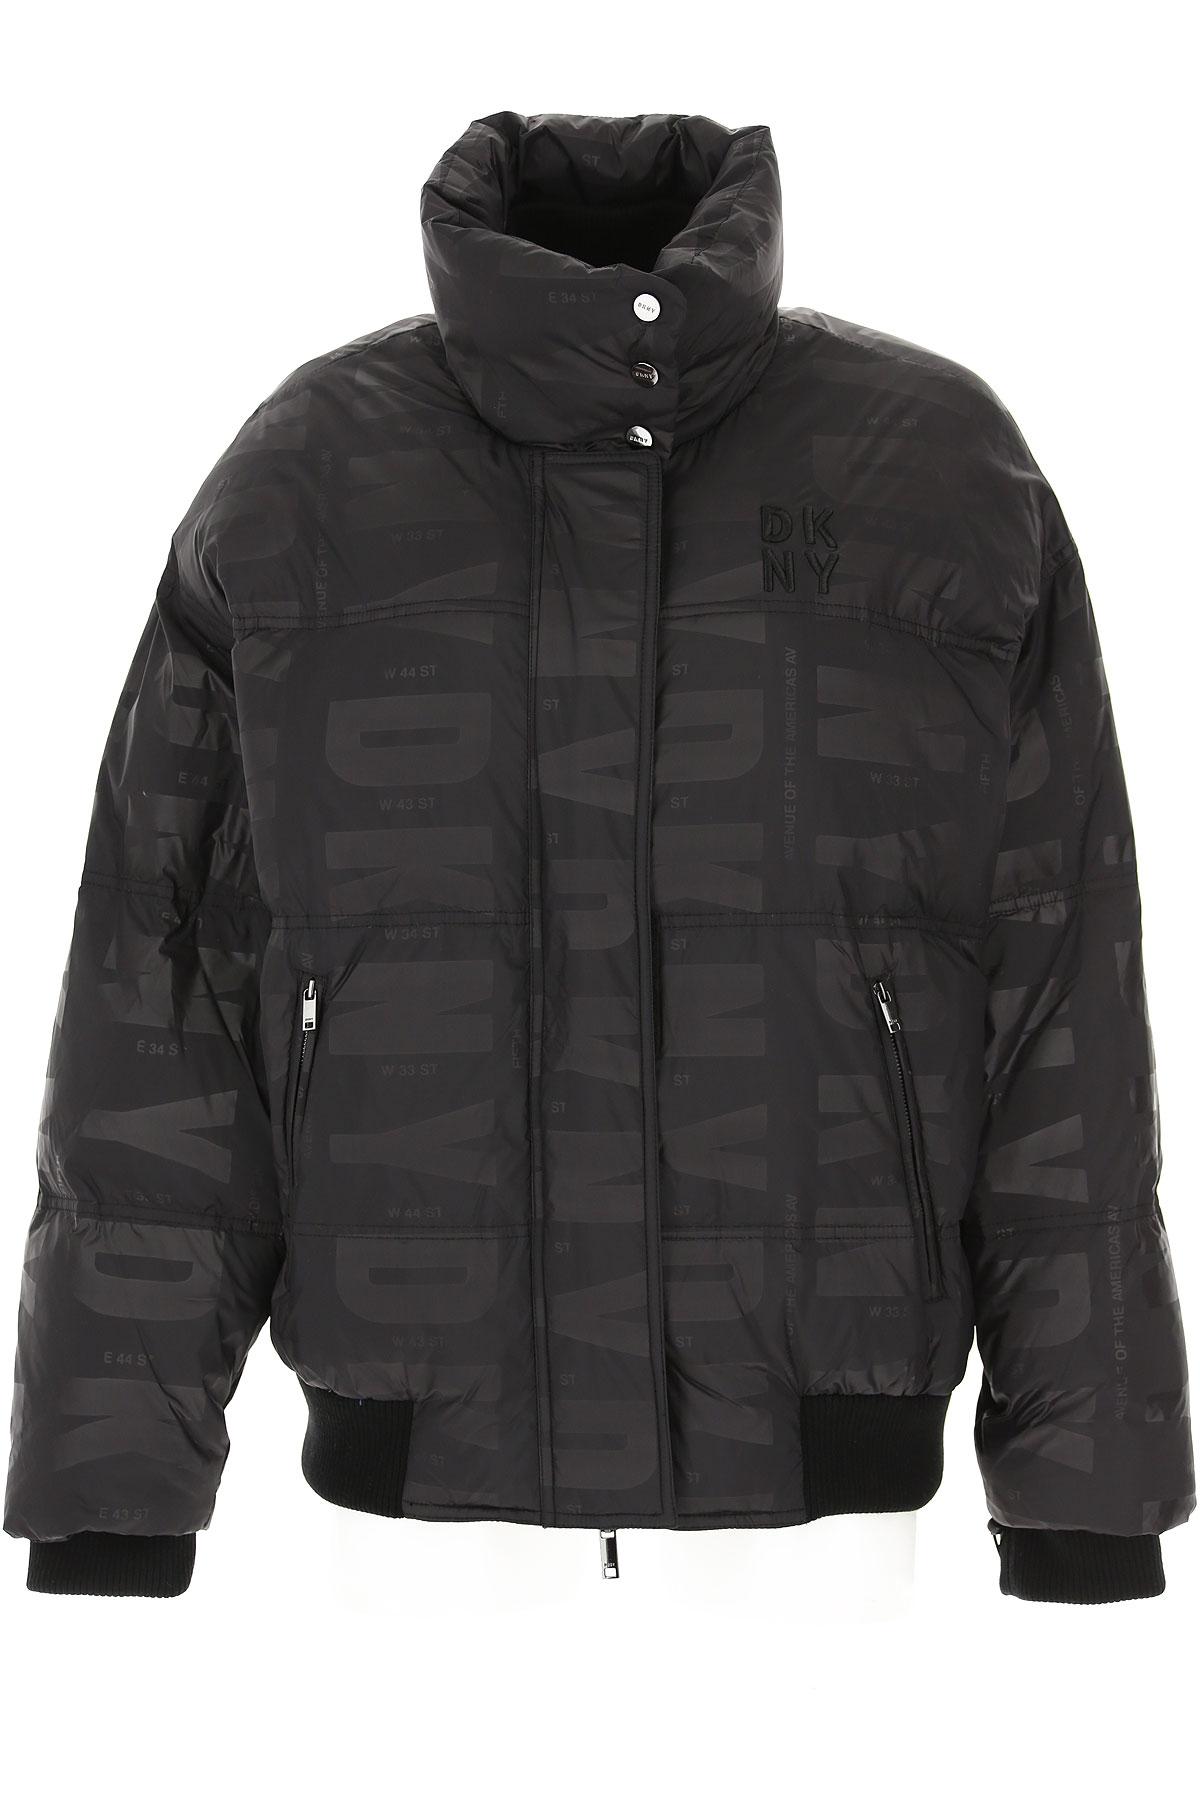 DKNY Down Jacket for Women, Puffer Ski Jacket On Sale, Black, polyester, 2019, 2 4 6 8